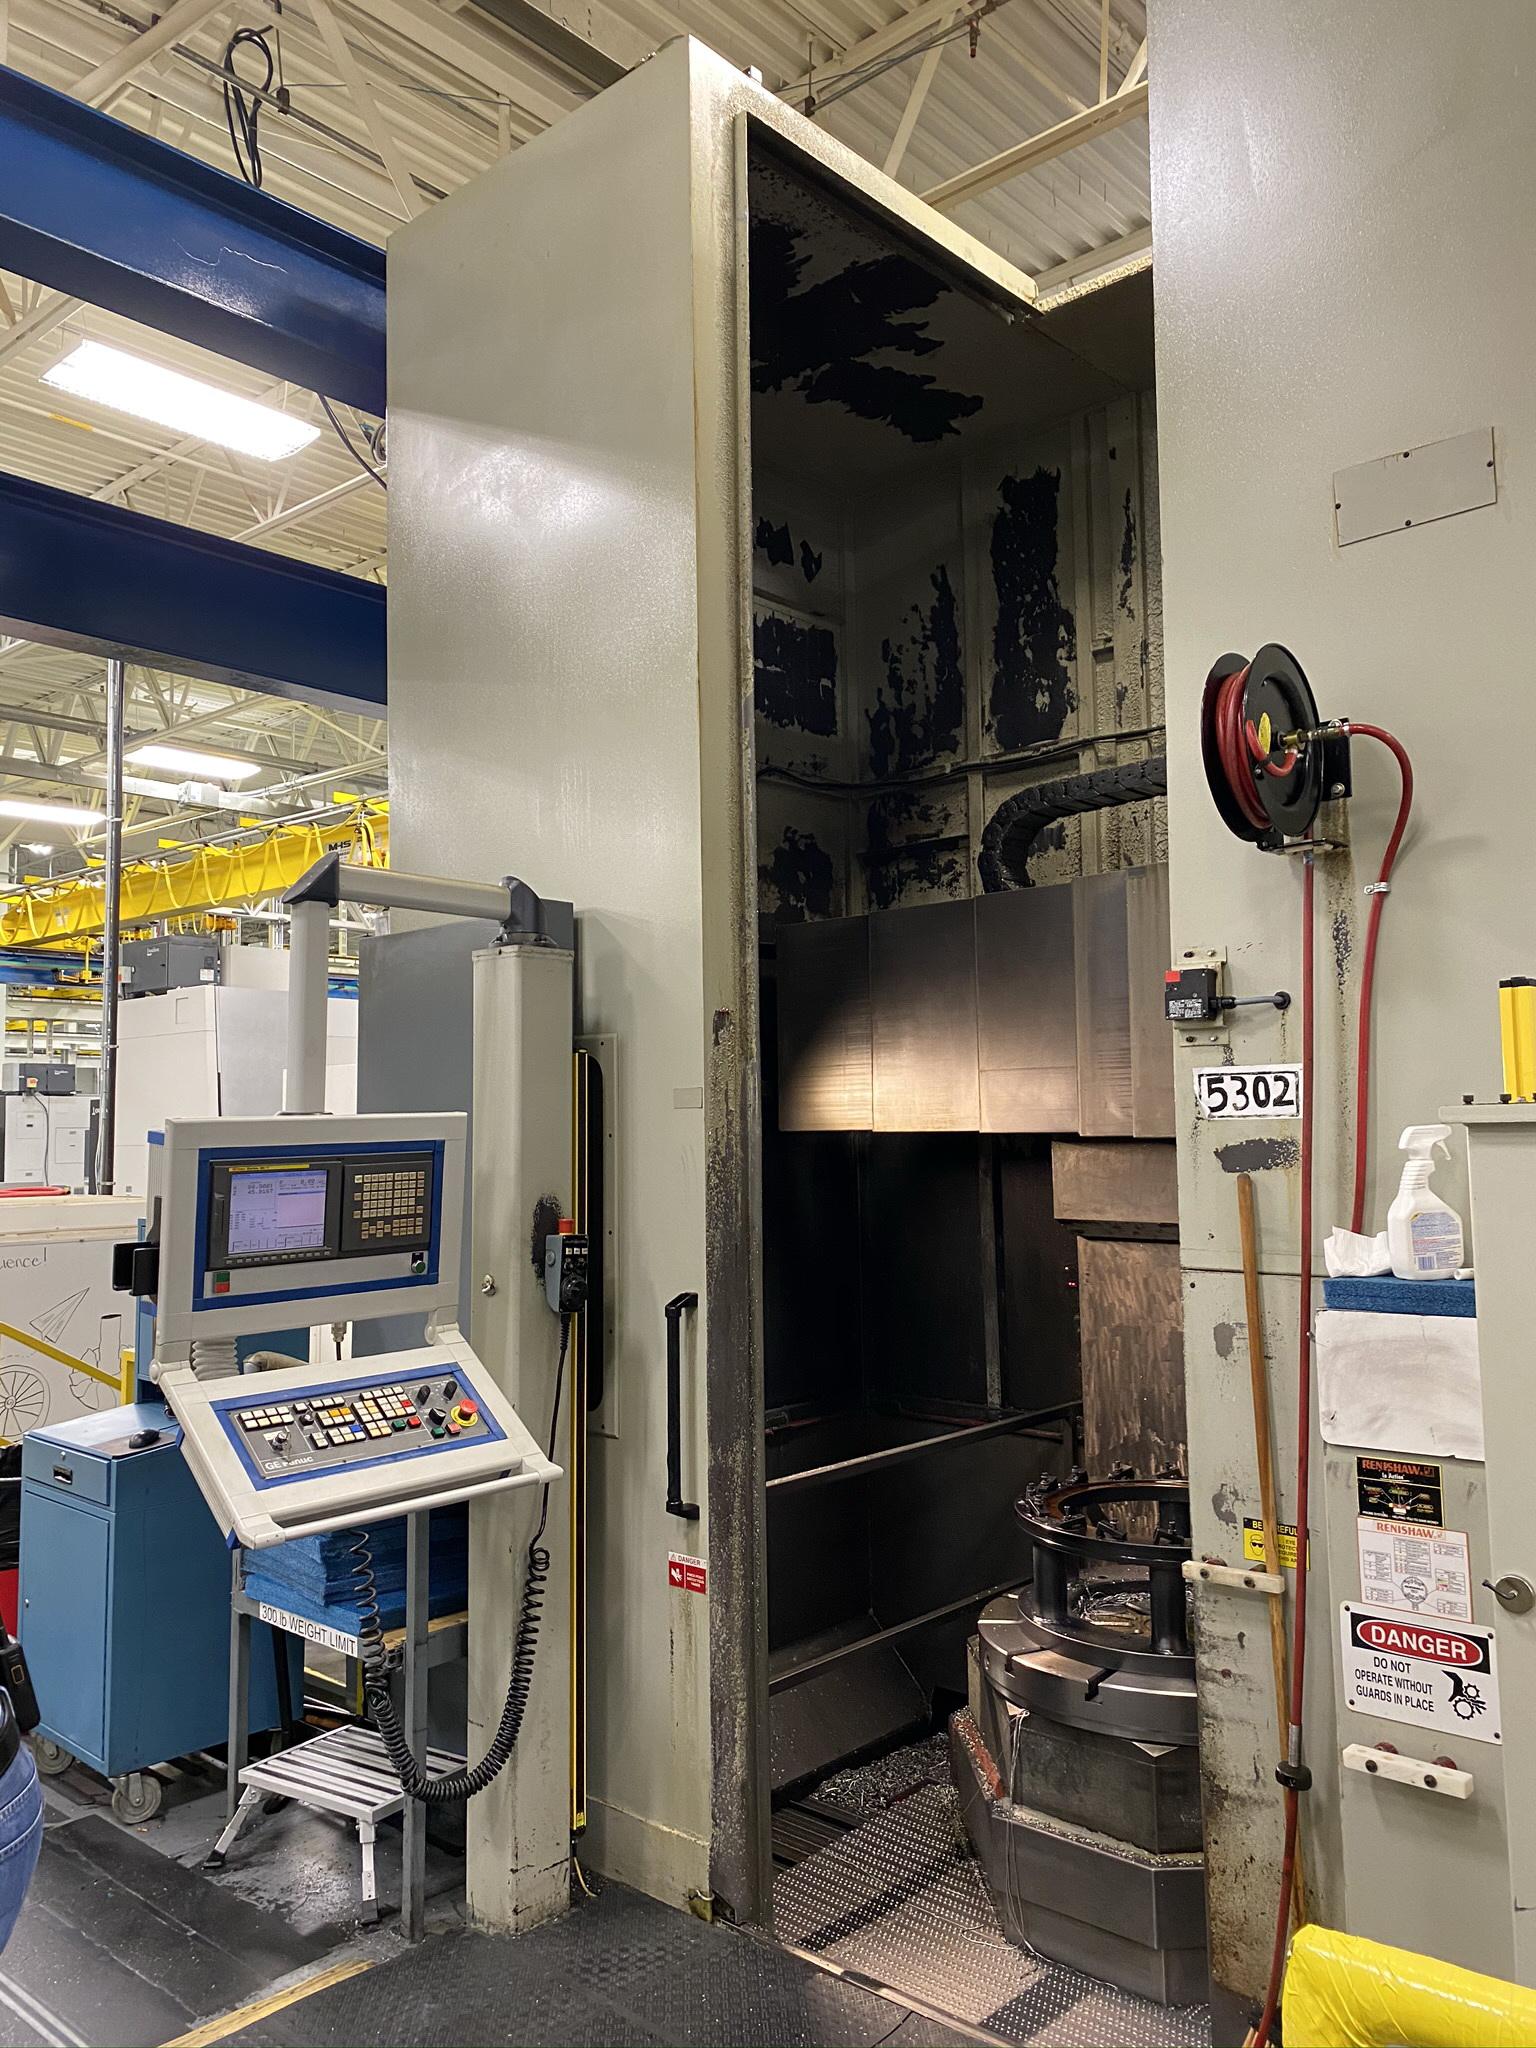 2008 Olympia Model V40 PF CNC Vertical Turning Center (Lot 2)